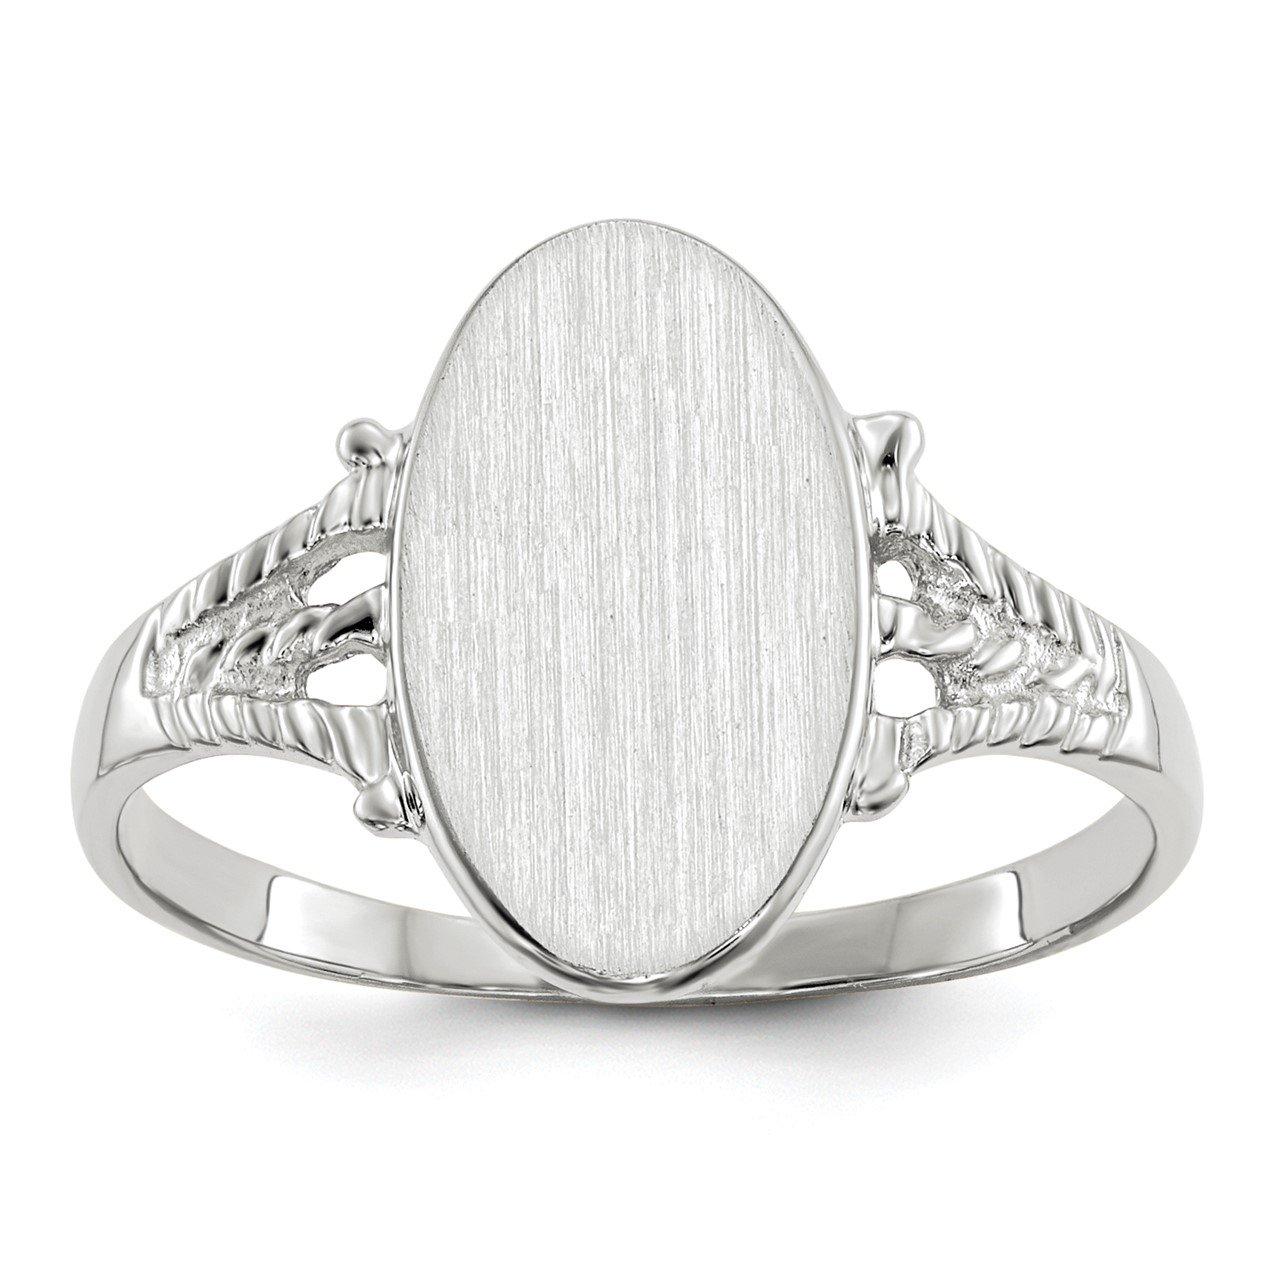 14k White Gold 13.5x8.5mm Closed Back Signet Ring